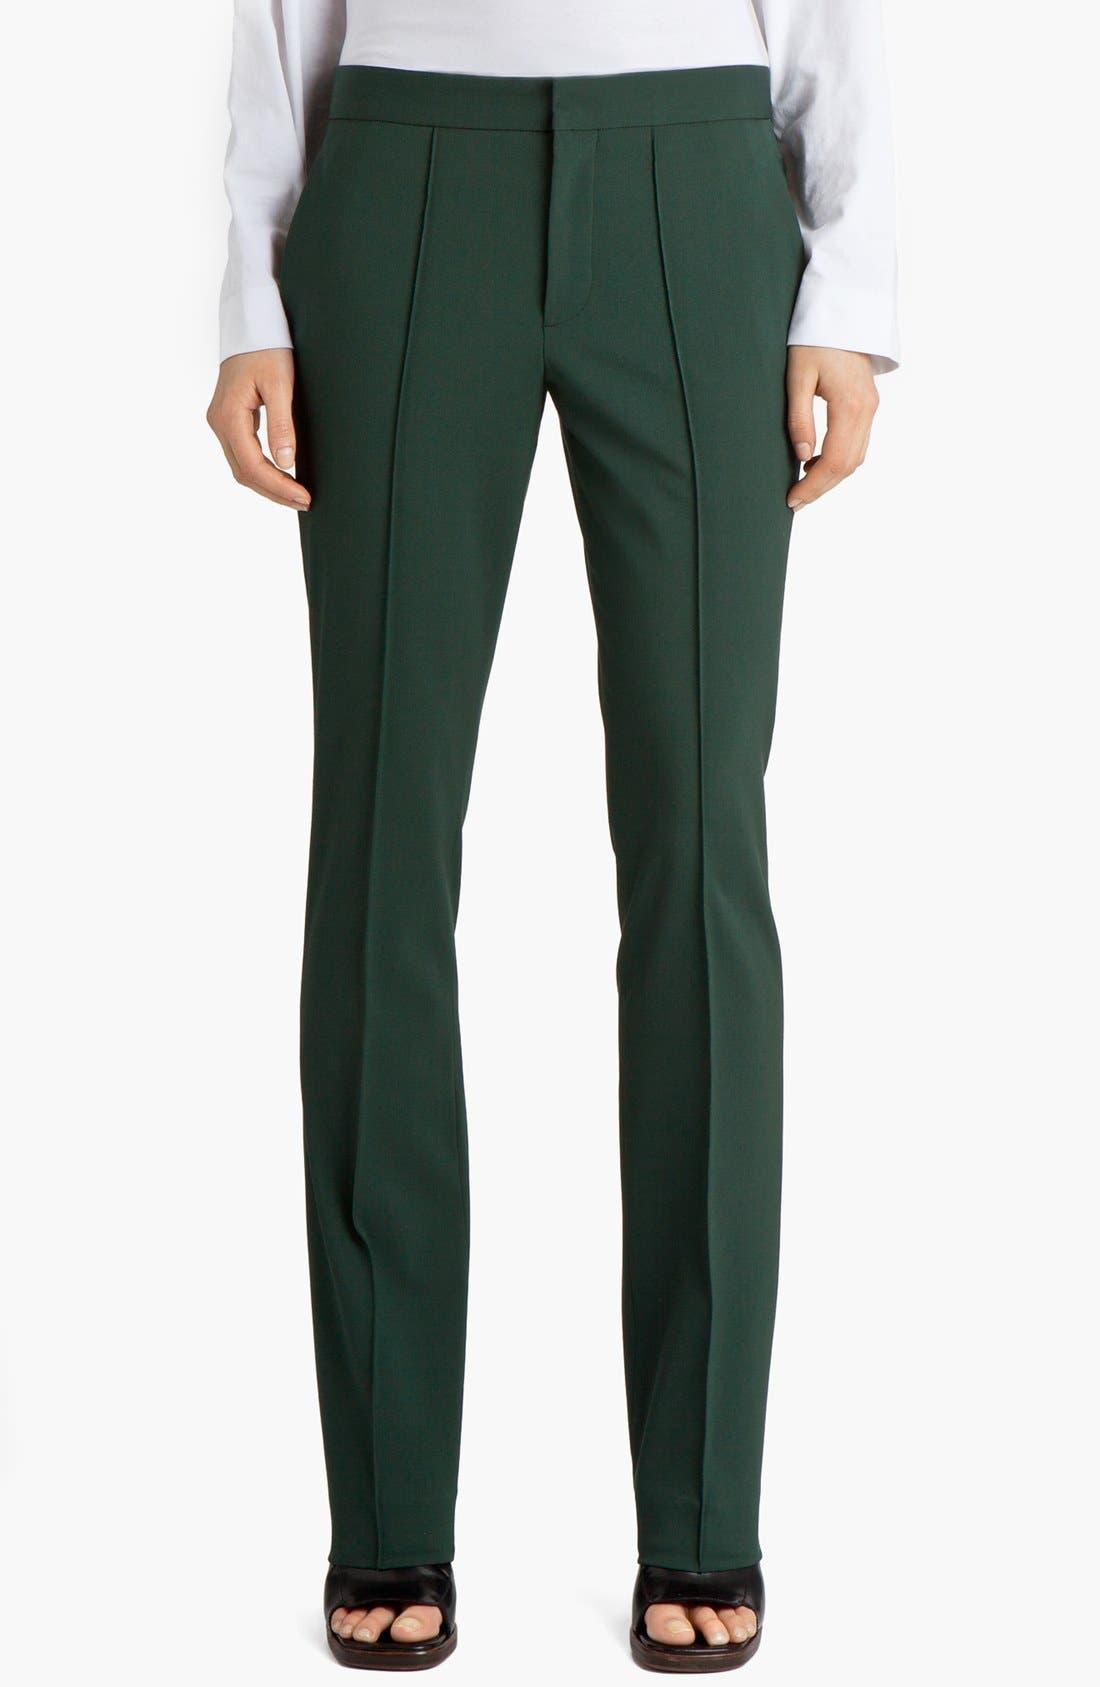 Alternate Image 1 Selected - Marni Narrow Leg Stretch Wool Pants